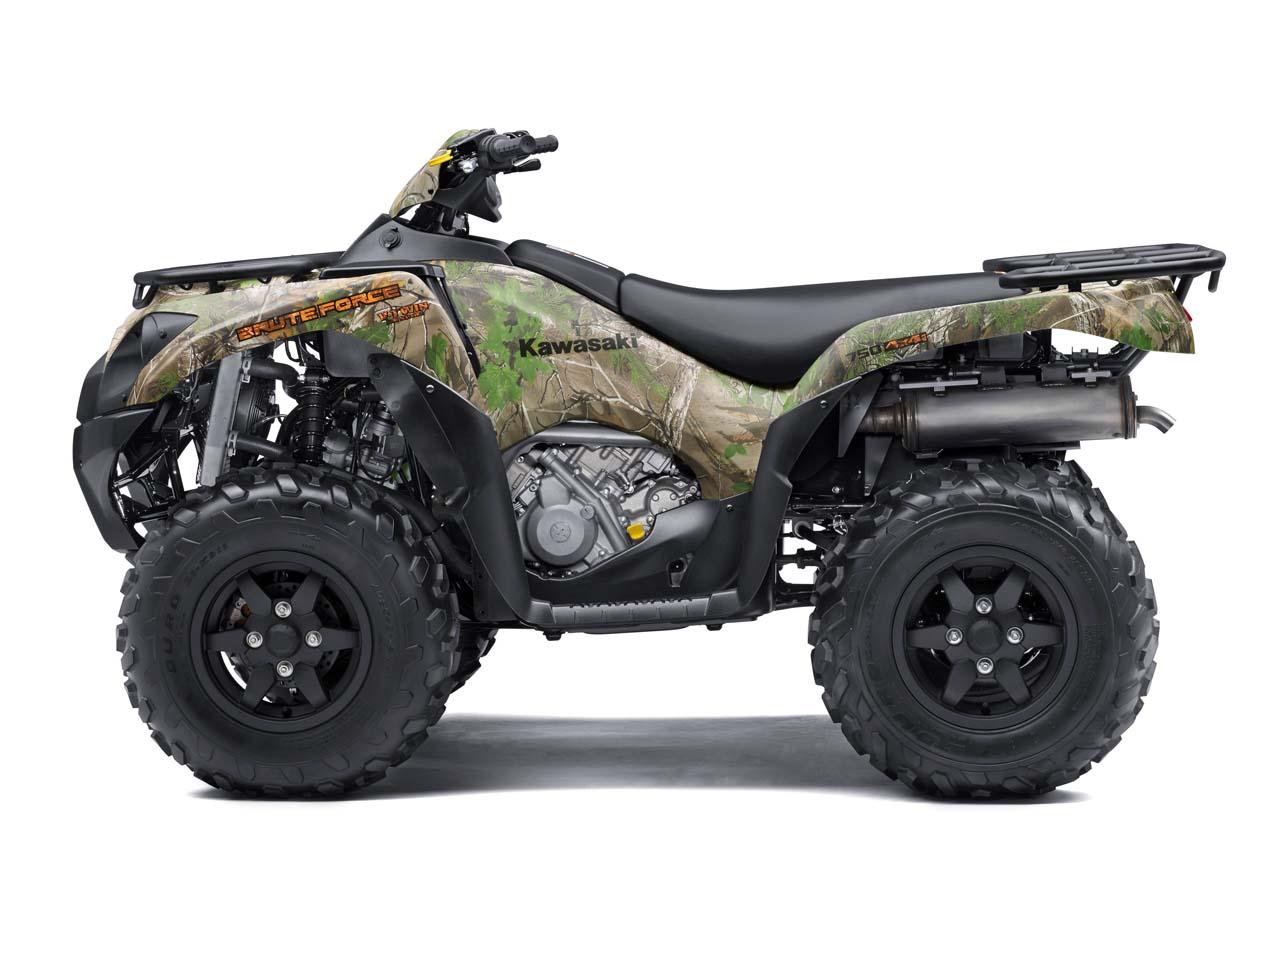 Kawasaki Brute Force Atv Model Range